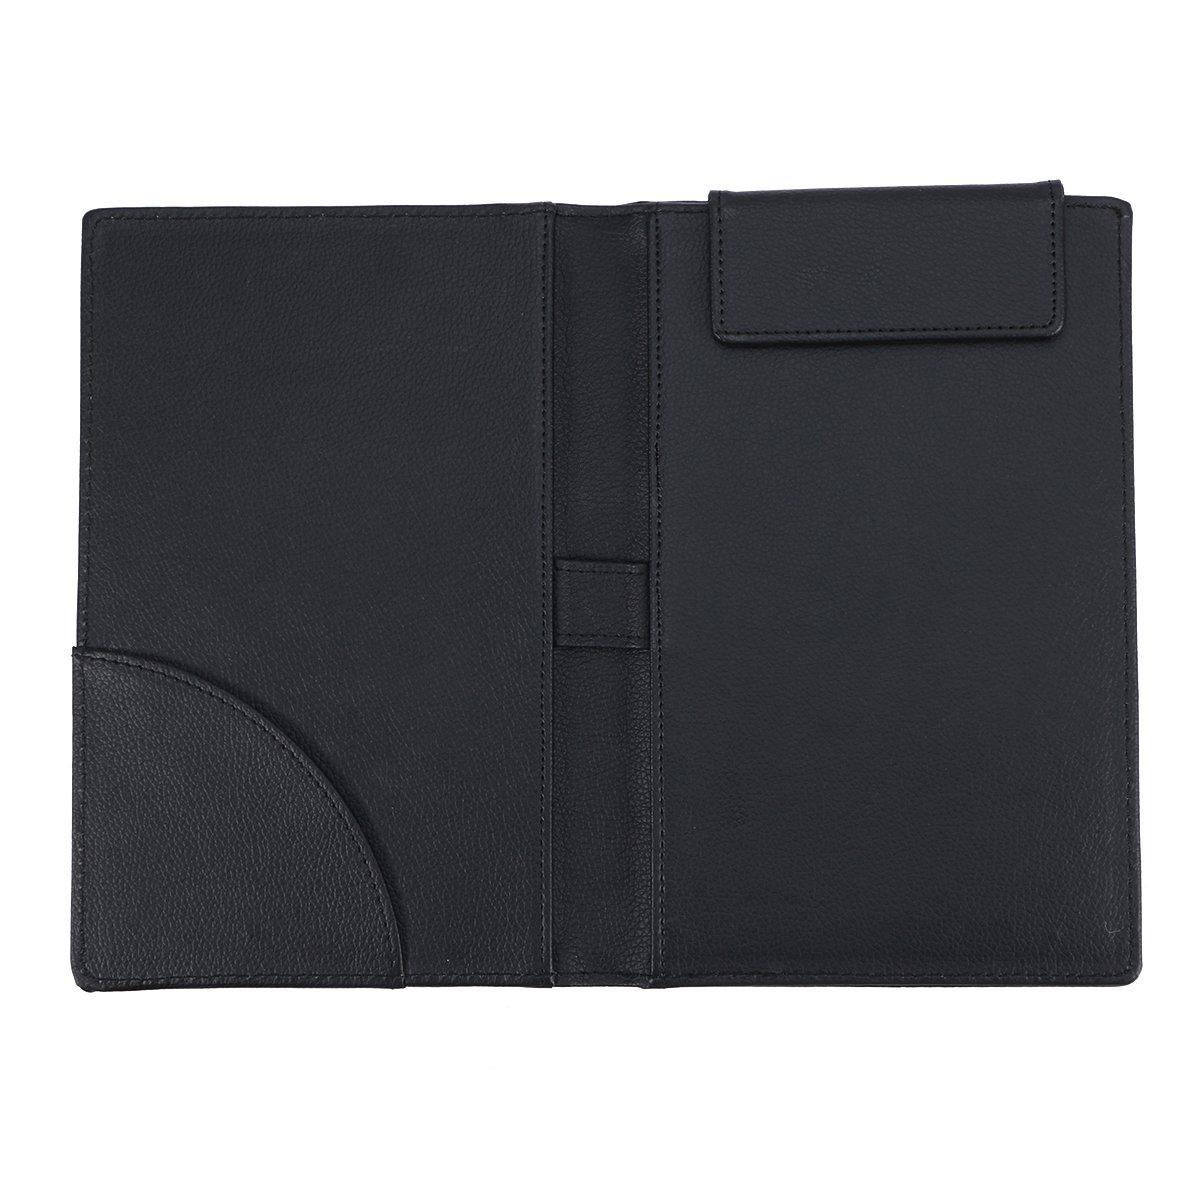 VORCOOL PU Leather Menu Folder Guest Check Presenter with Pen Clip for Hotel Bar Salon KTV Restaurant (A067 Black)